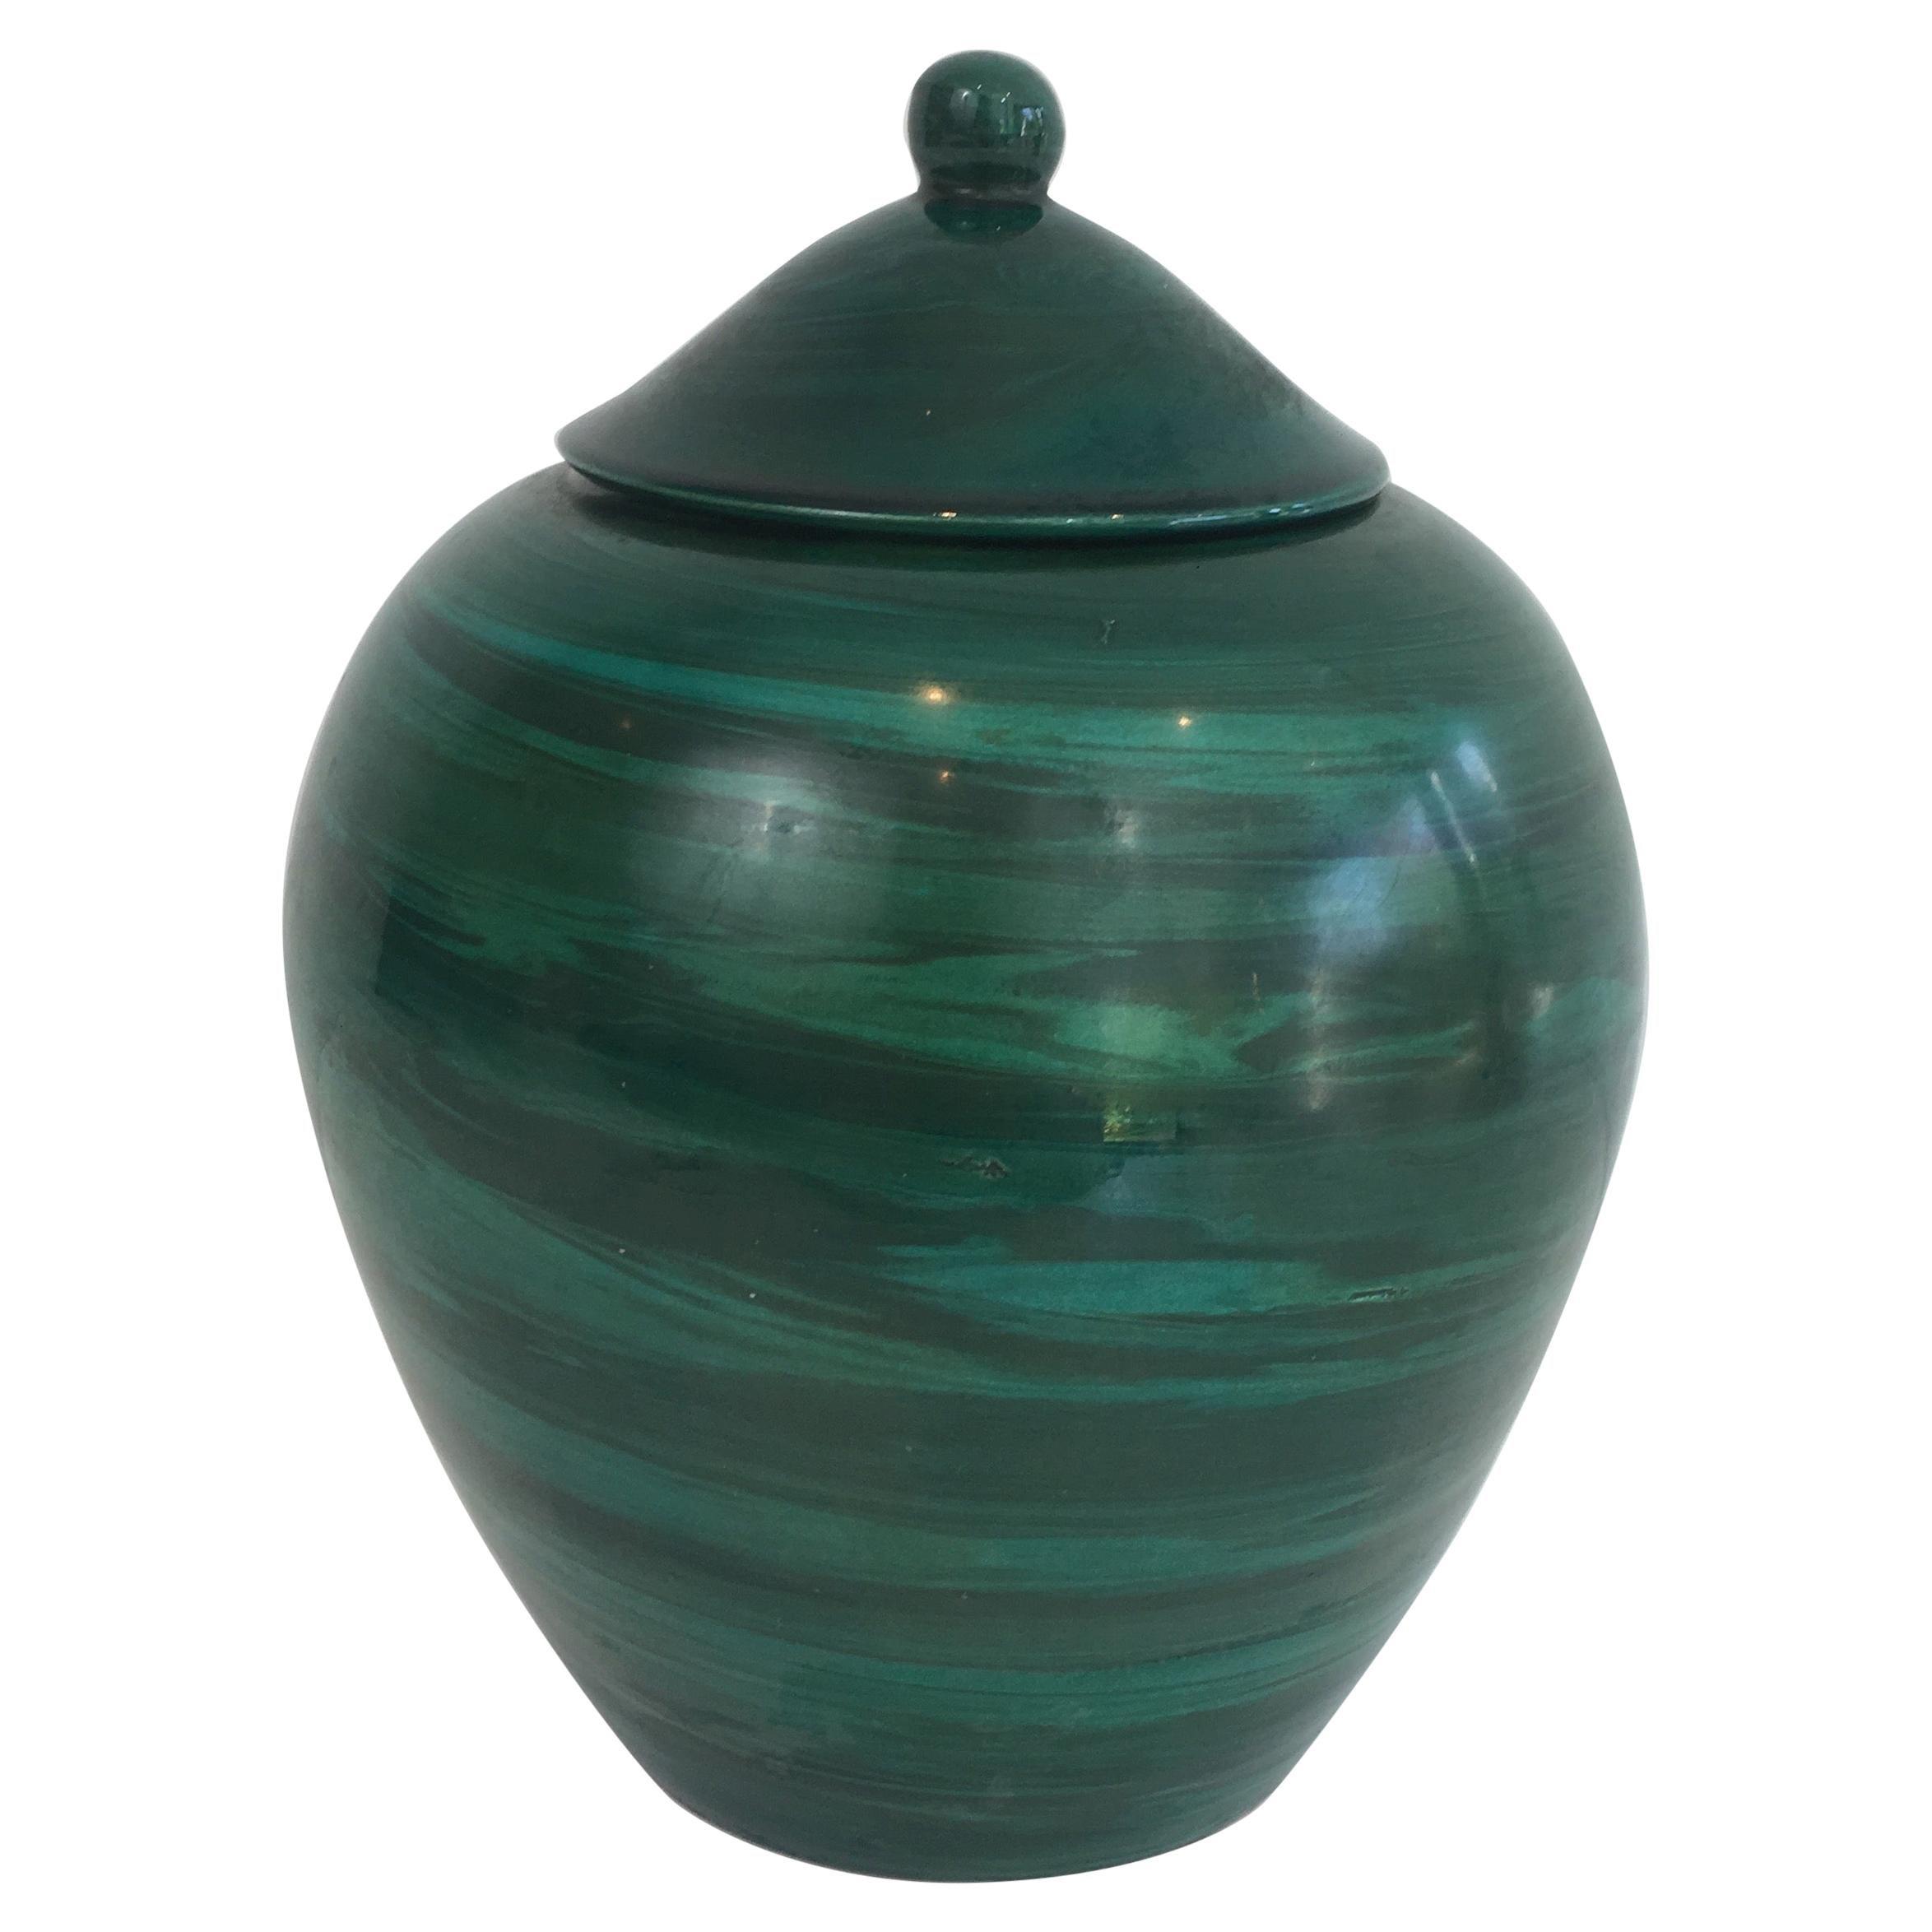 Decorative Ceramic Covered Pot, French, circa 1950